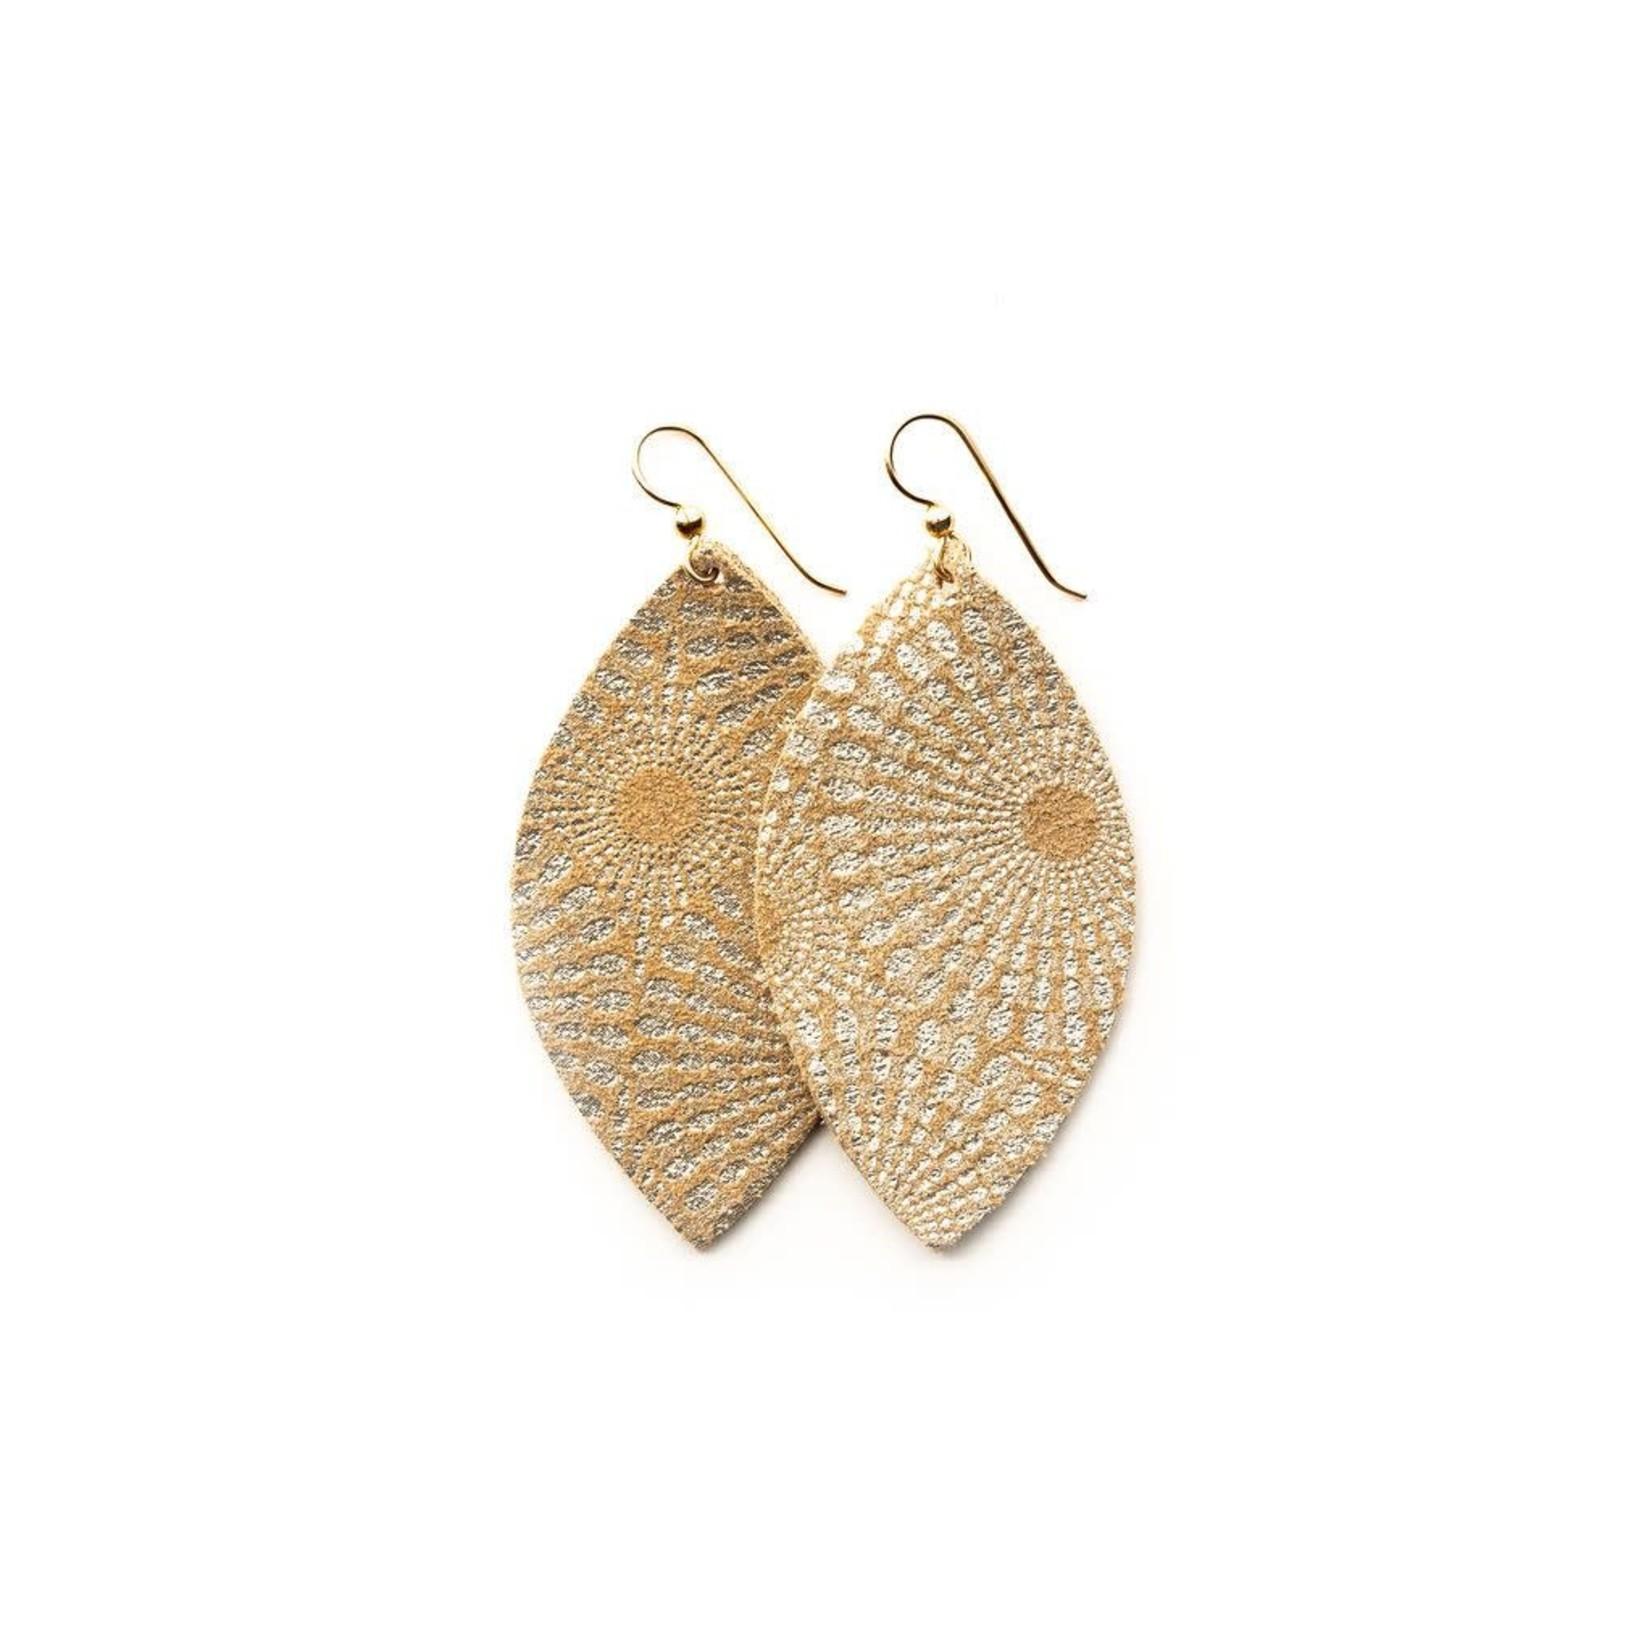 Keva Style Large Leather Gold Starburst Earrings